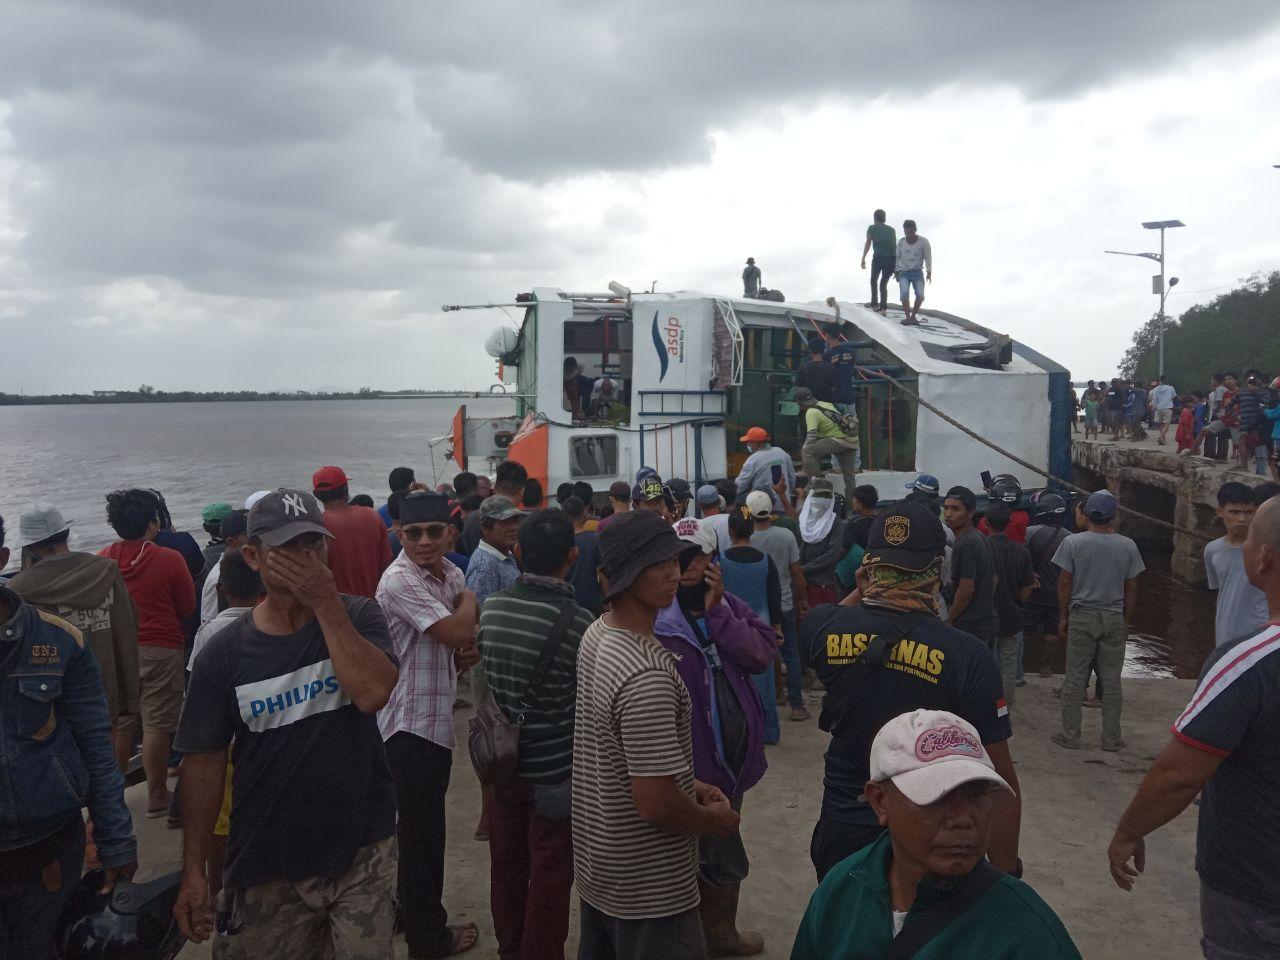 https: img.okezone.com content 2021 02 20 340 2365485 kapal-ferry-terbalik-dan-tenggelam-evakuasi-berjalan-dramatis-enNIEA4tmF.jpg